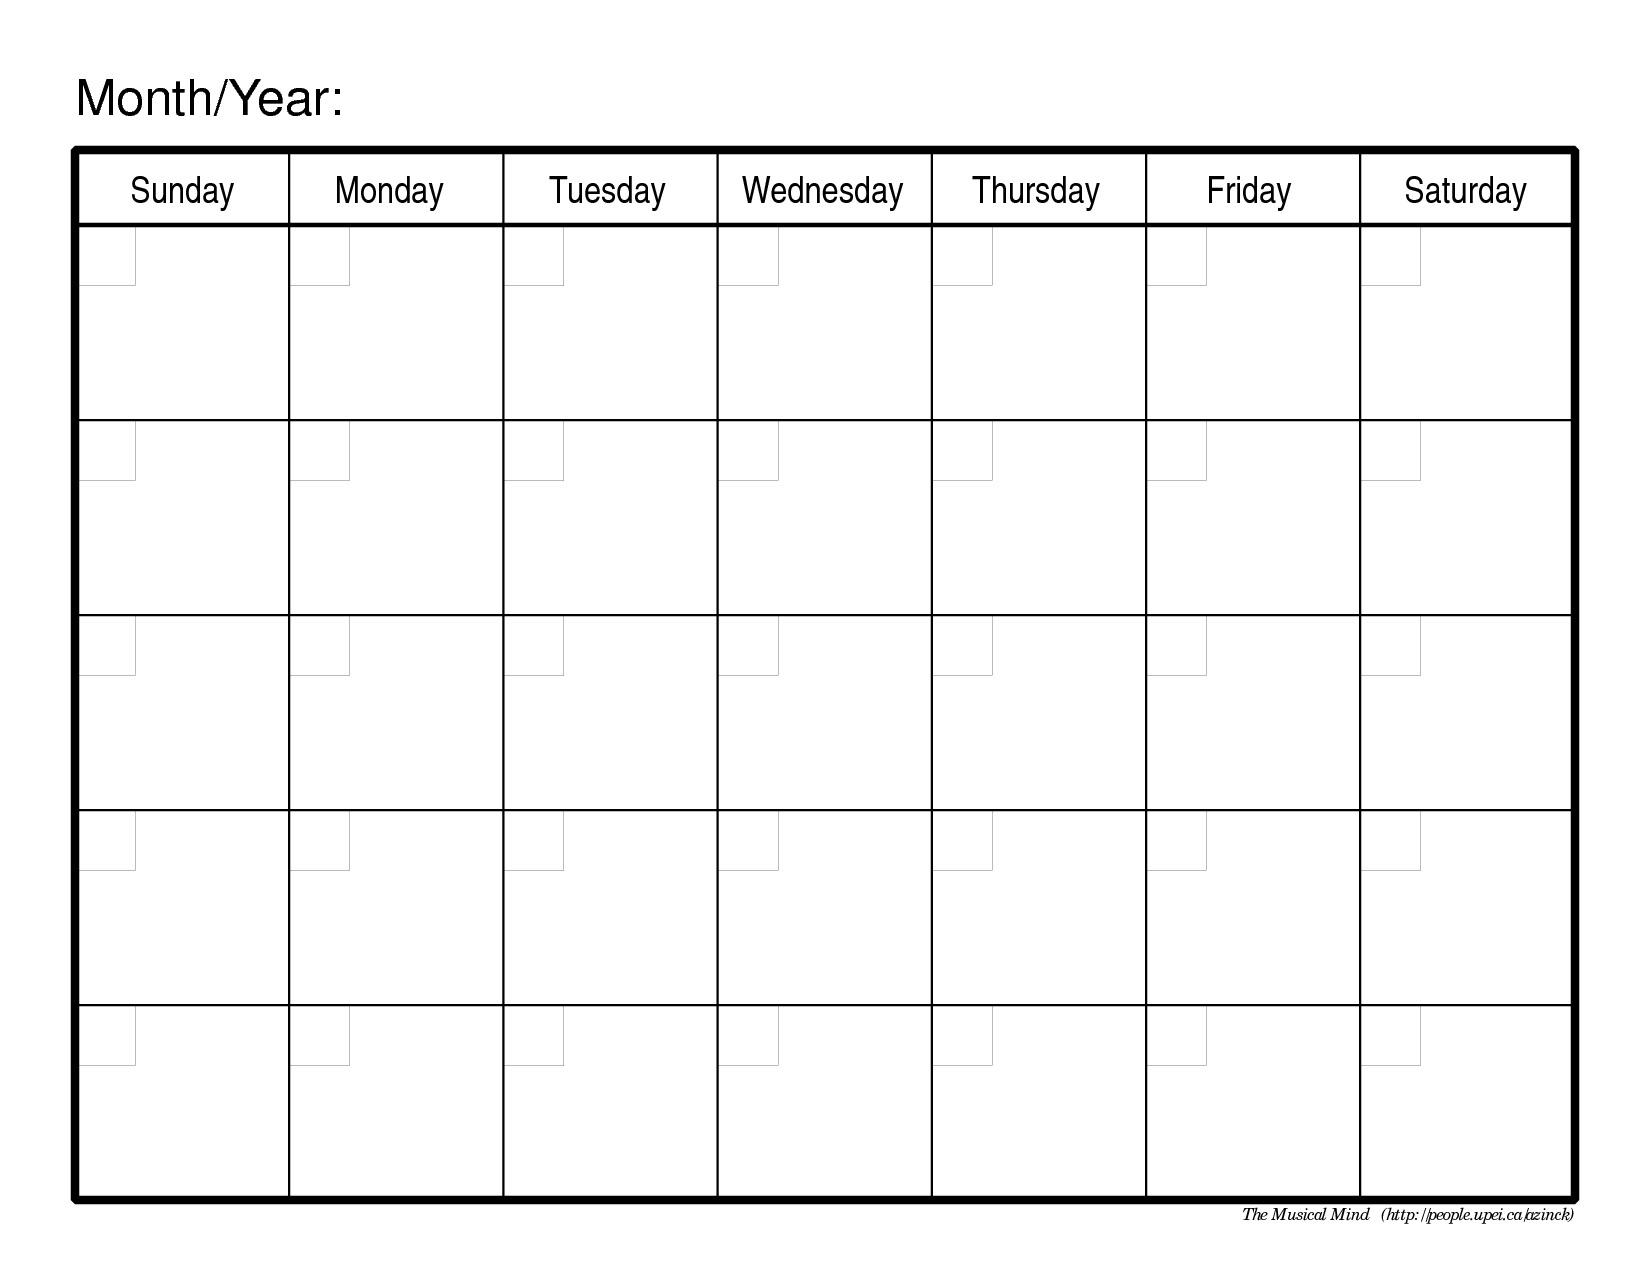 Dashing 8 X 11 Blank Calendar Page • Printable Blank Calendar Template_8 X 11 Blank Calendar Page